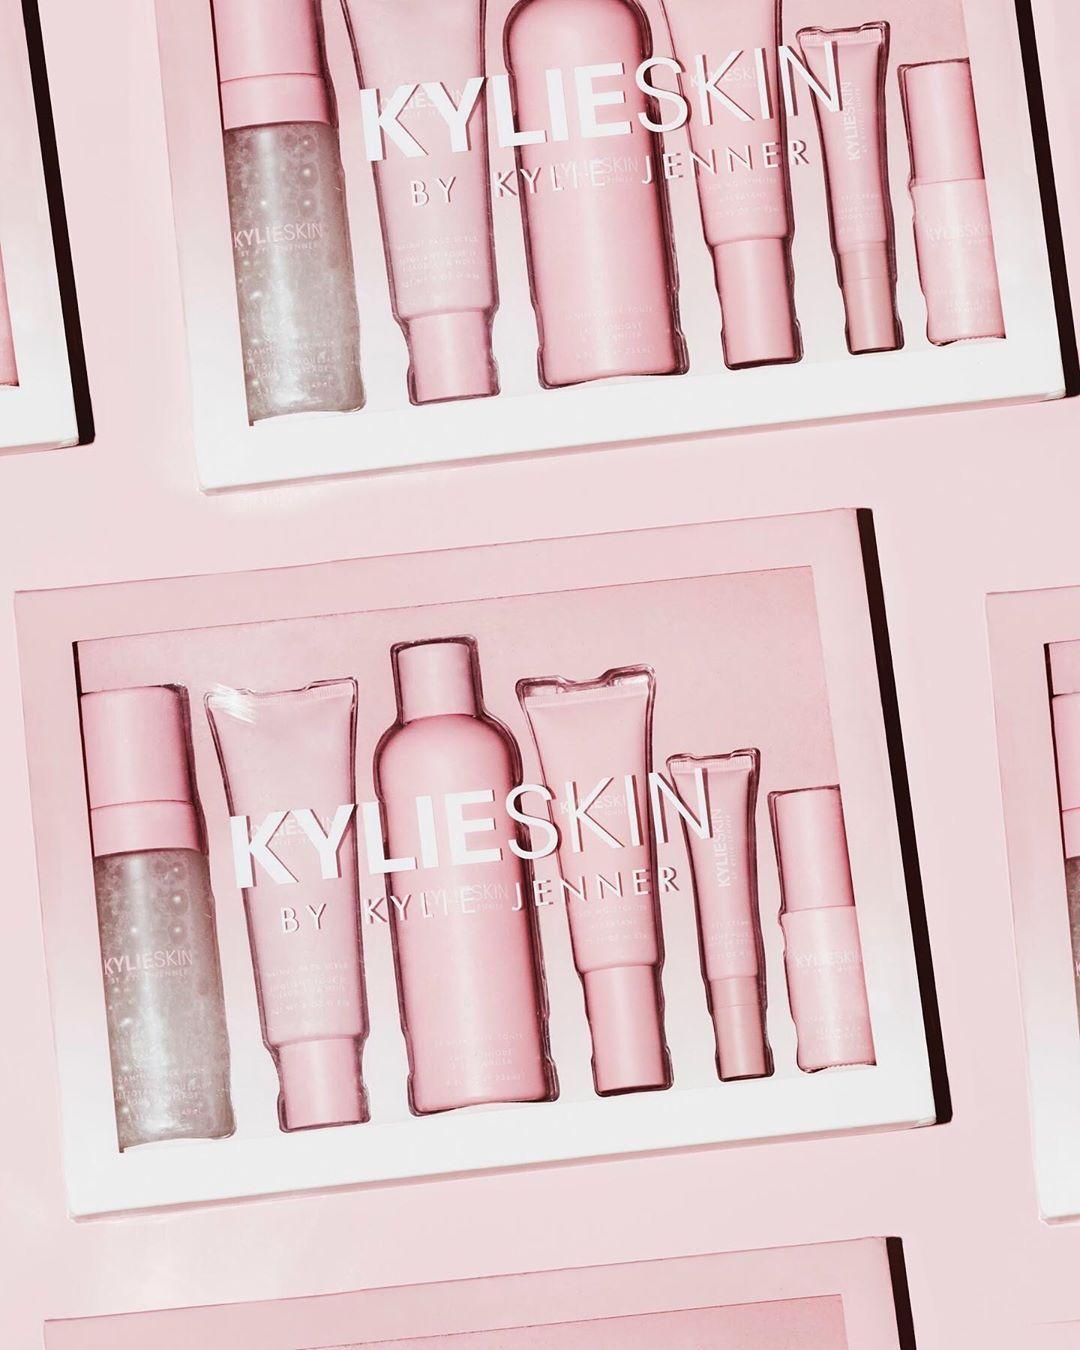 Kylie Skin Set In 2020 Skin Cosmetics Kylie Jenner Makeup Collection Kylie Jenner Makeup